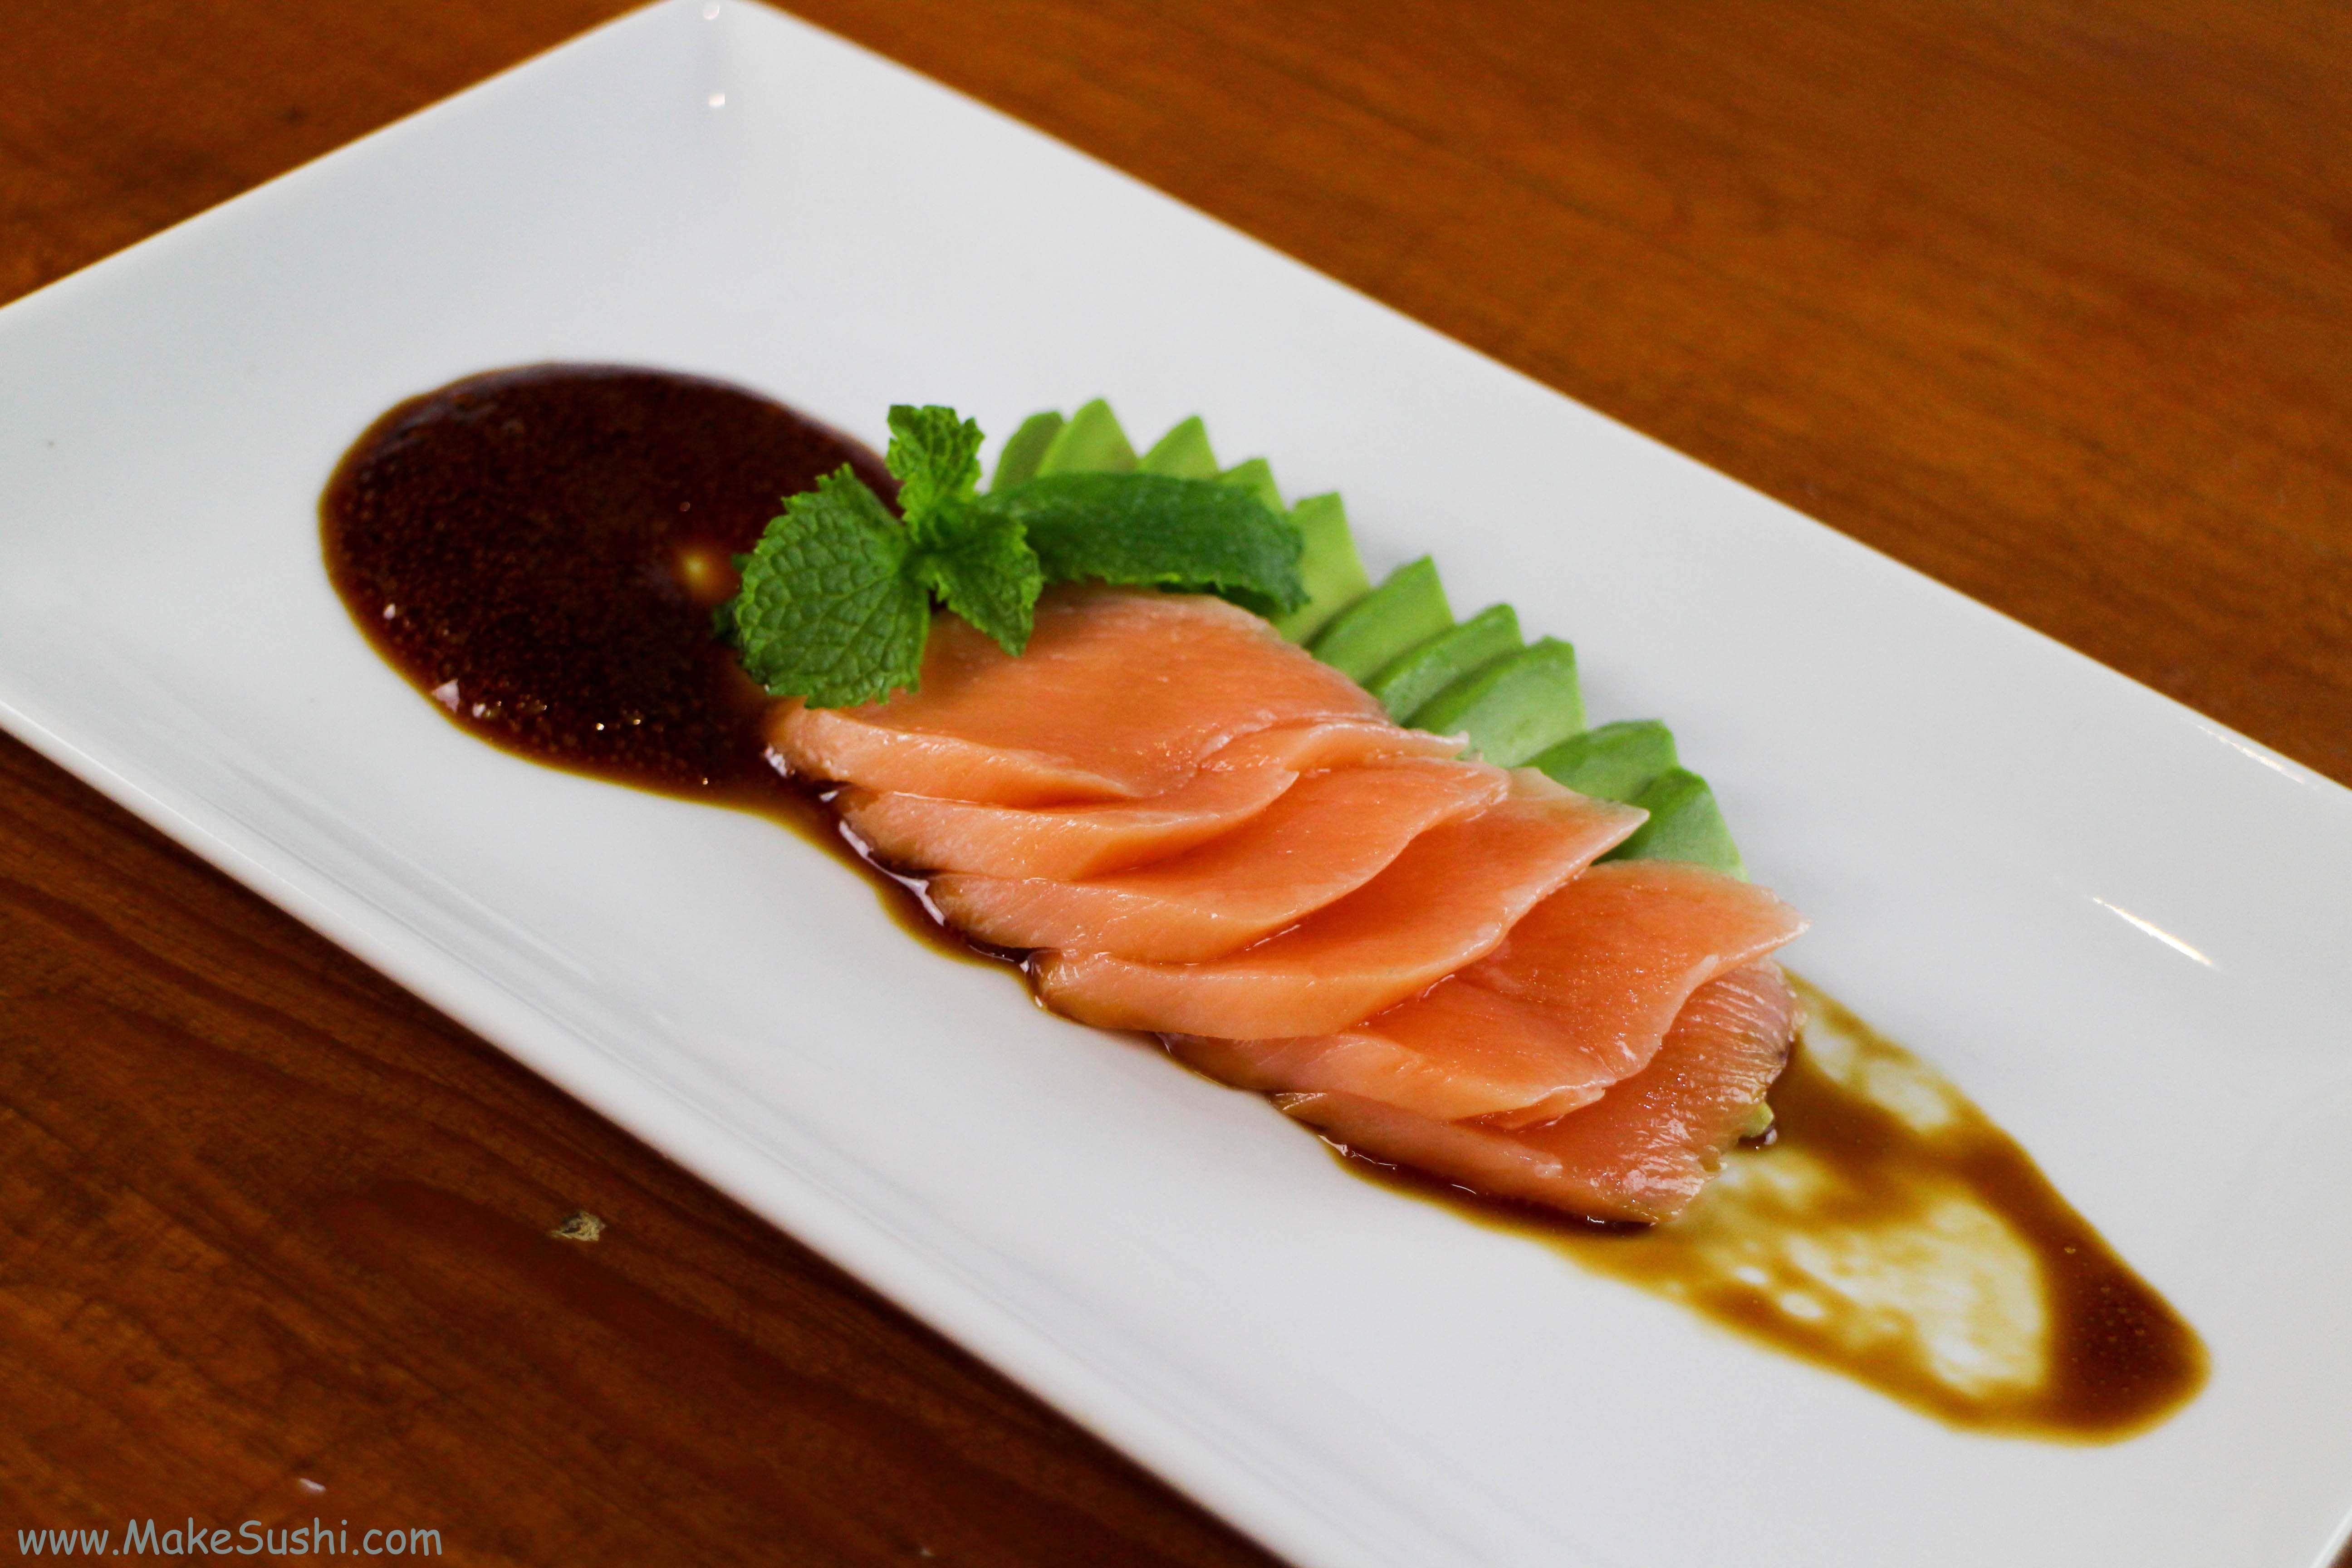 Cooked Salmon Sashimi Recipe Make Sushi Cooking Salmon Sushi Dishes Recipes